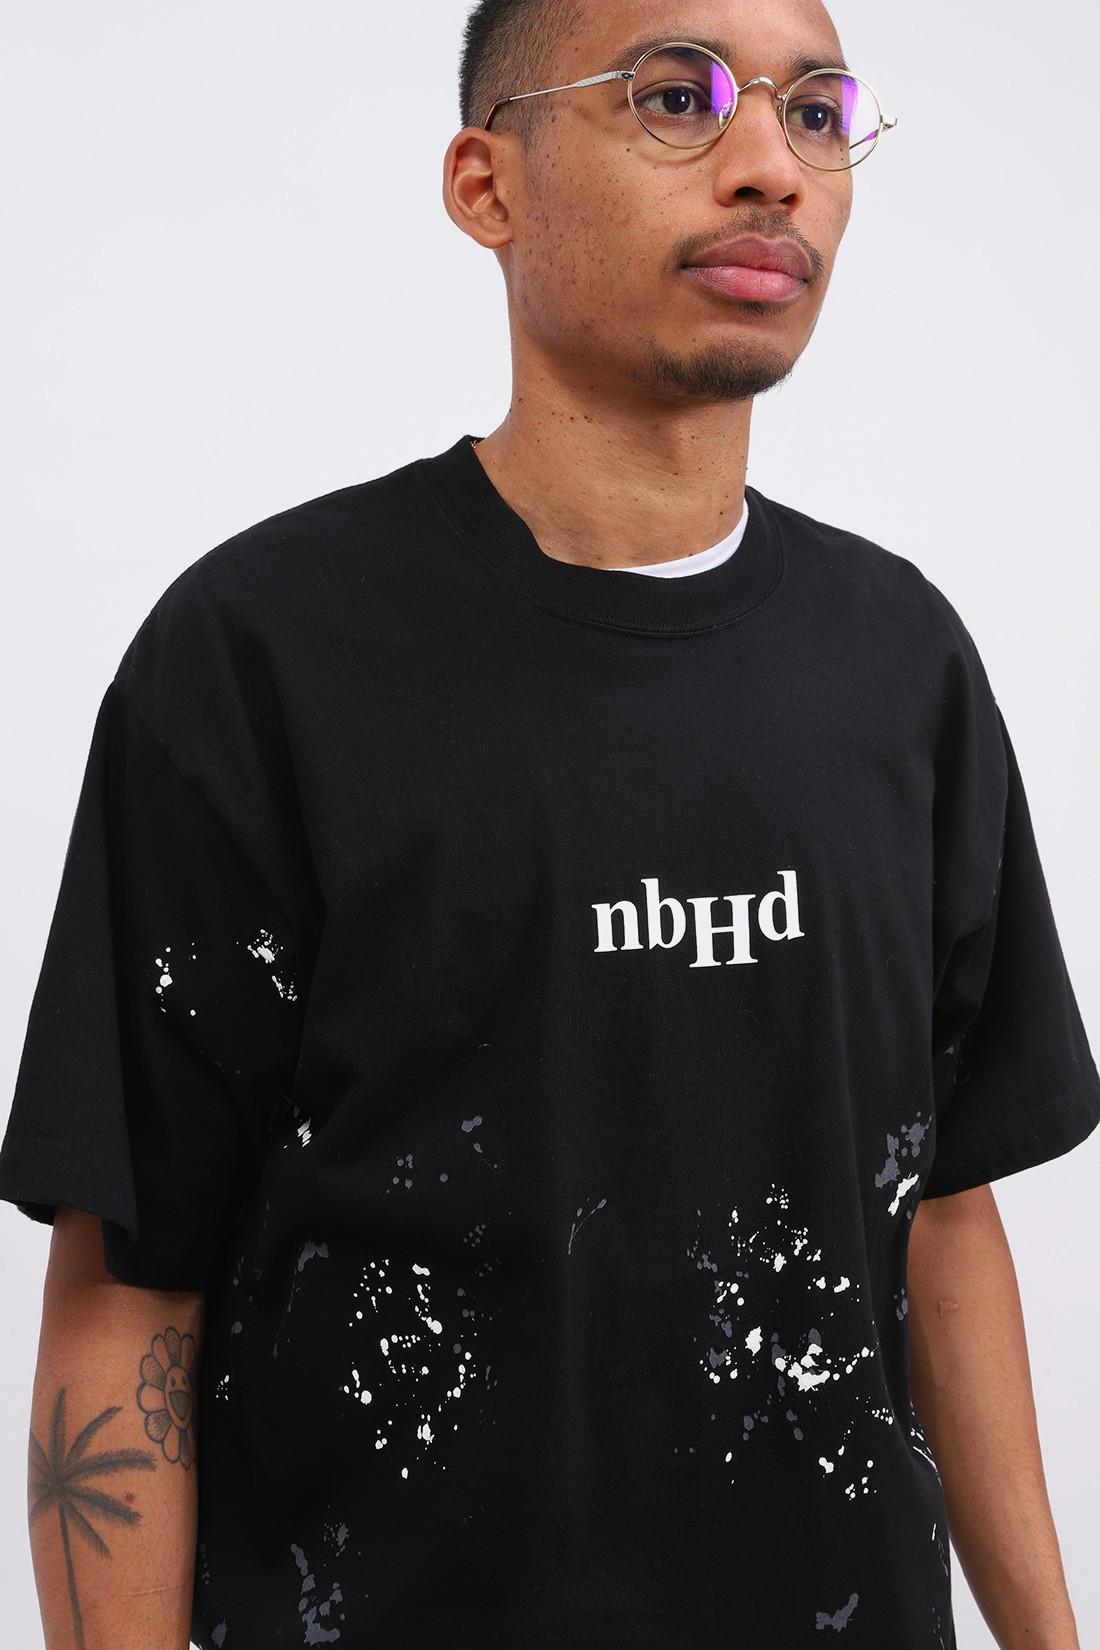 NEIGHBORHOOD / Drip / c-tee .ss Black